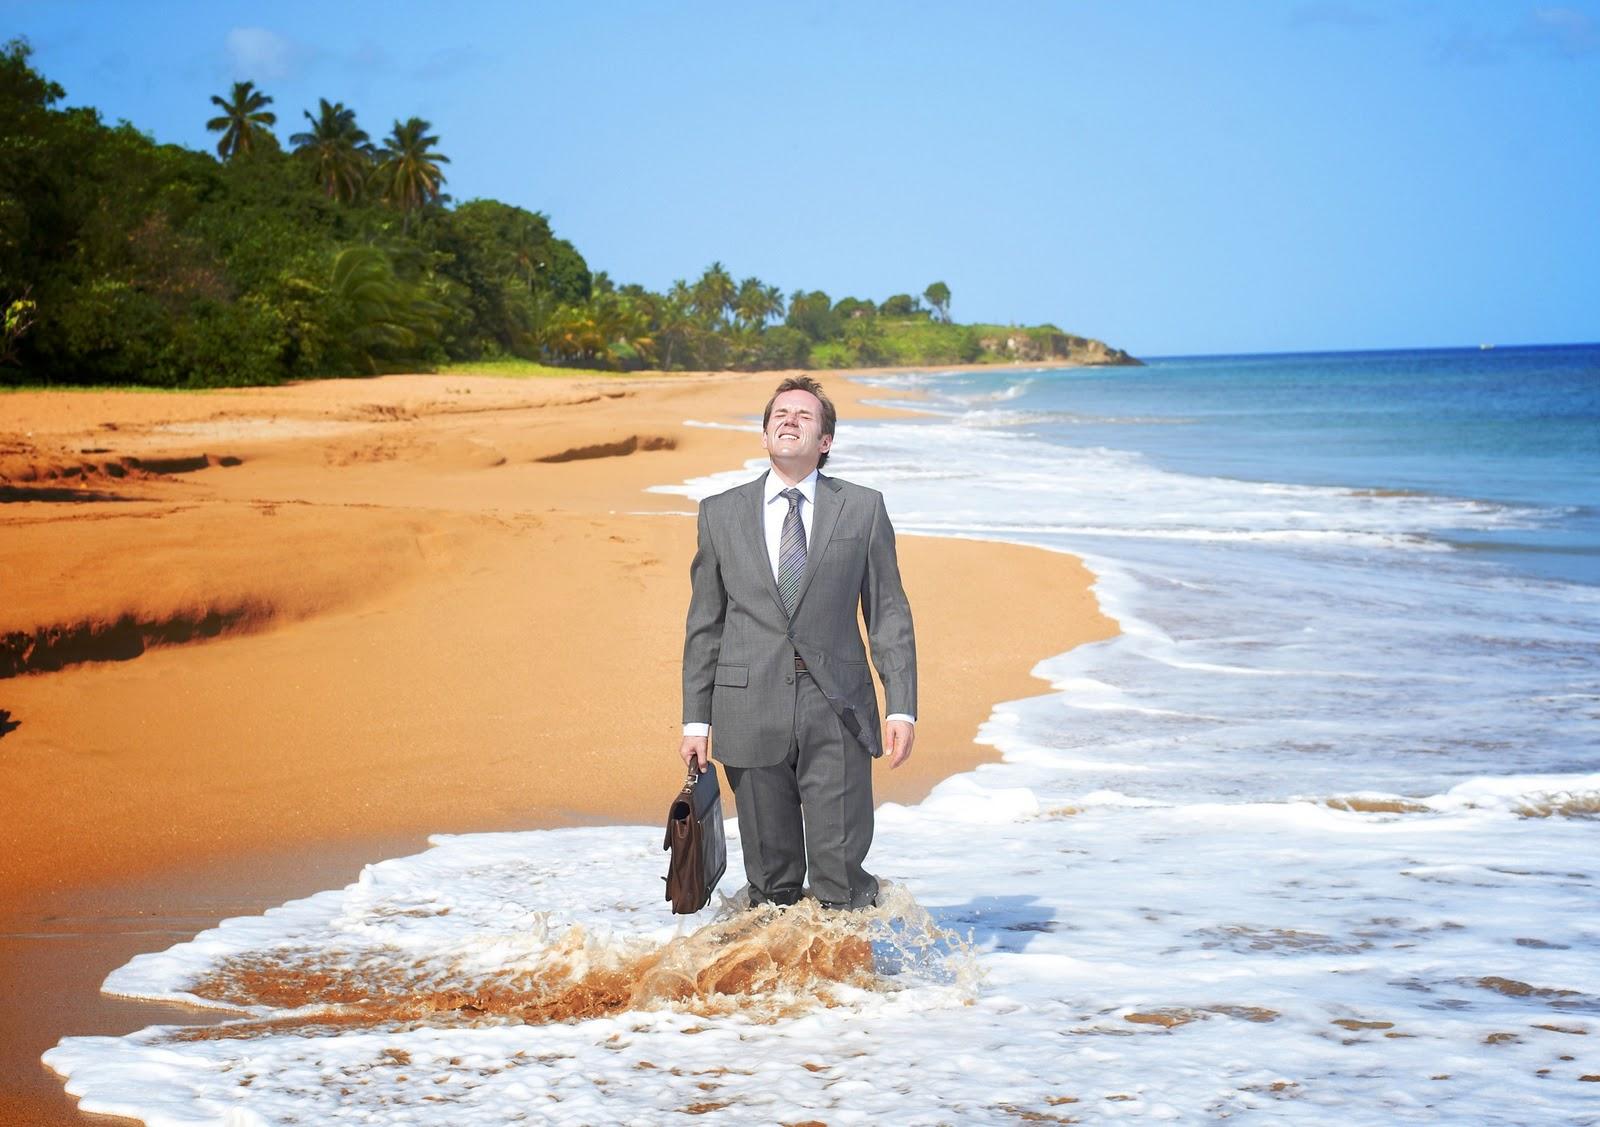 http://www.theartsdesk.com/sites/default/files/images/stories/FILM/tom_birchenough/death-side-beach.jpg